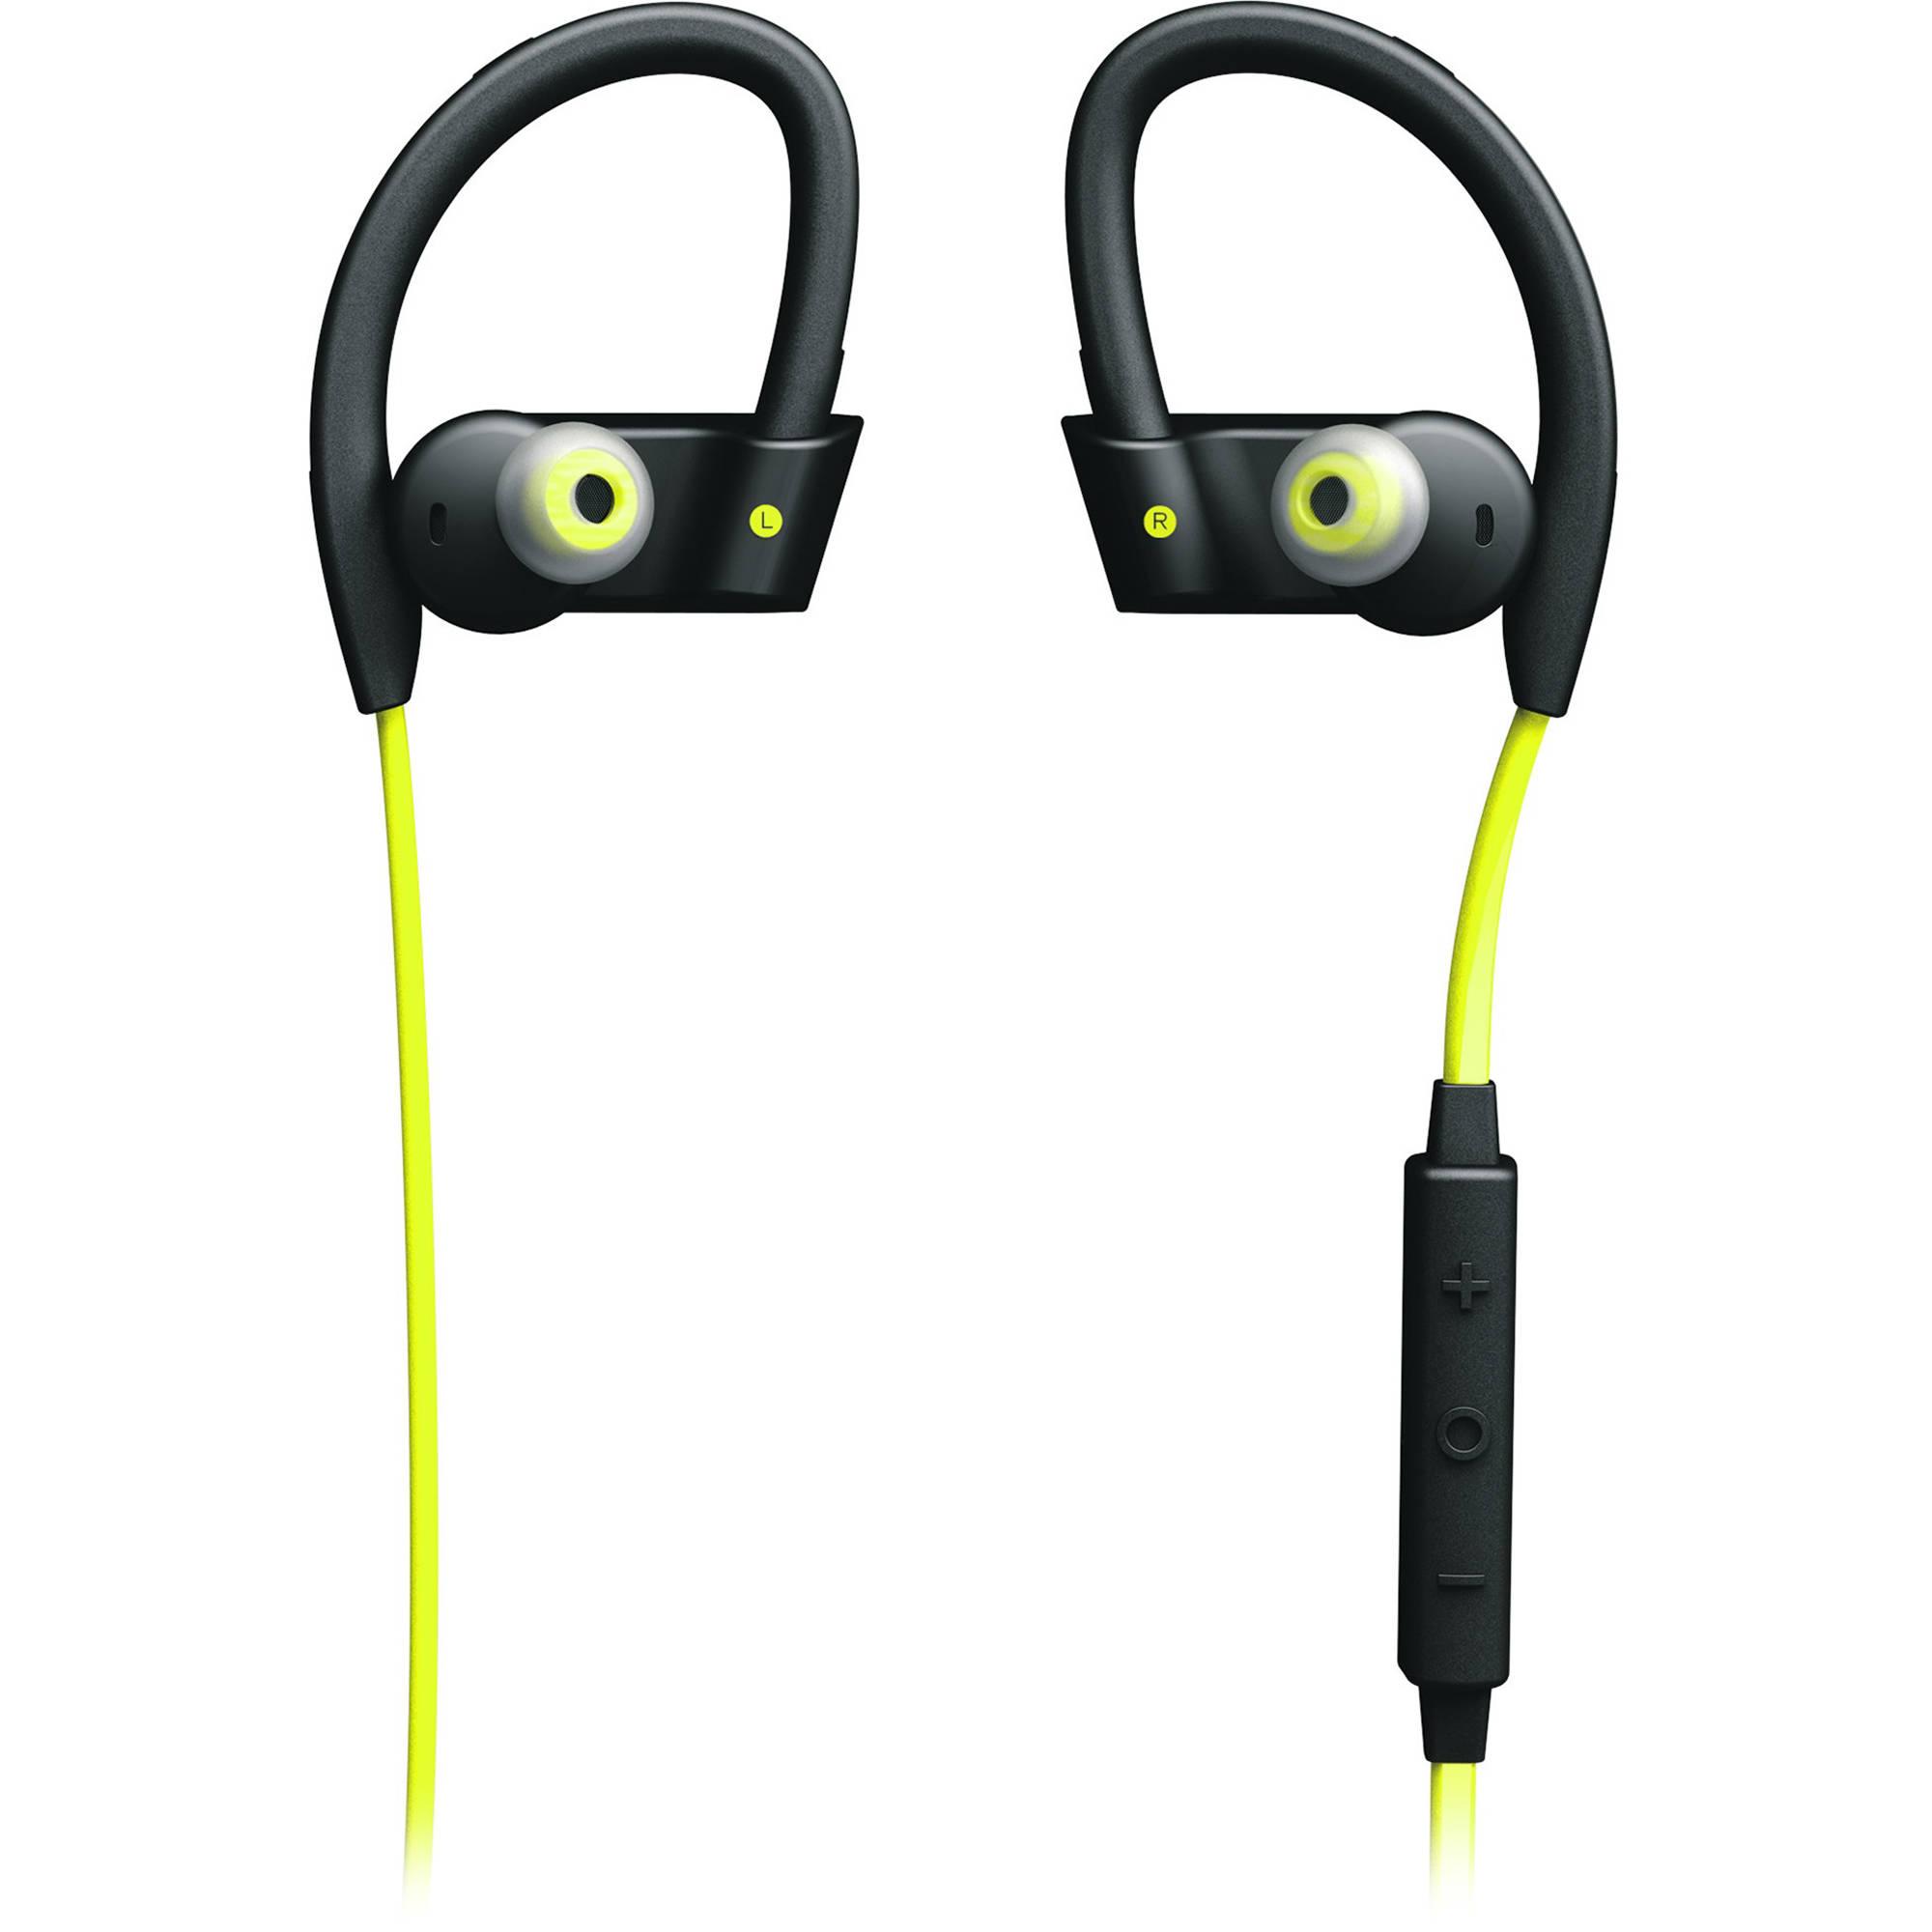 Jabra Sport Pace Wireless Headphones: Jabra Sport Pace Wireless Earbuds (Yellow/Black) 100